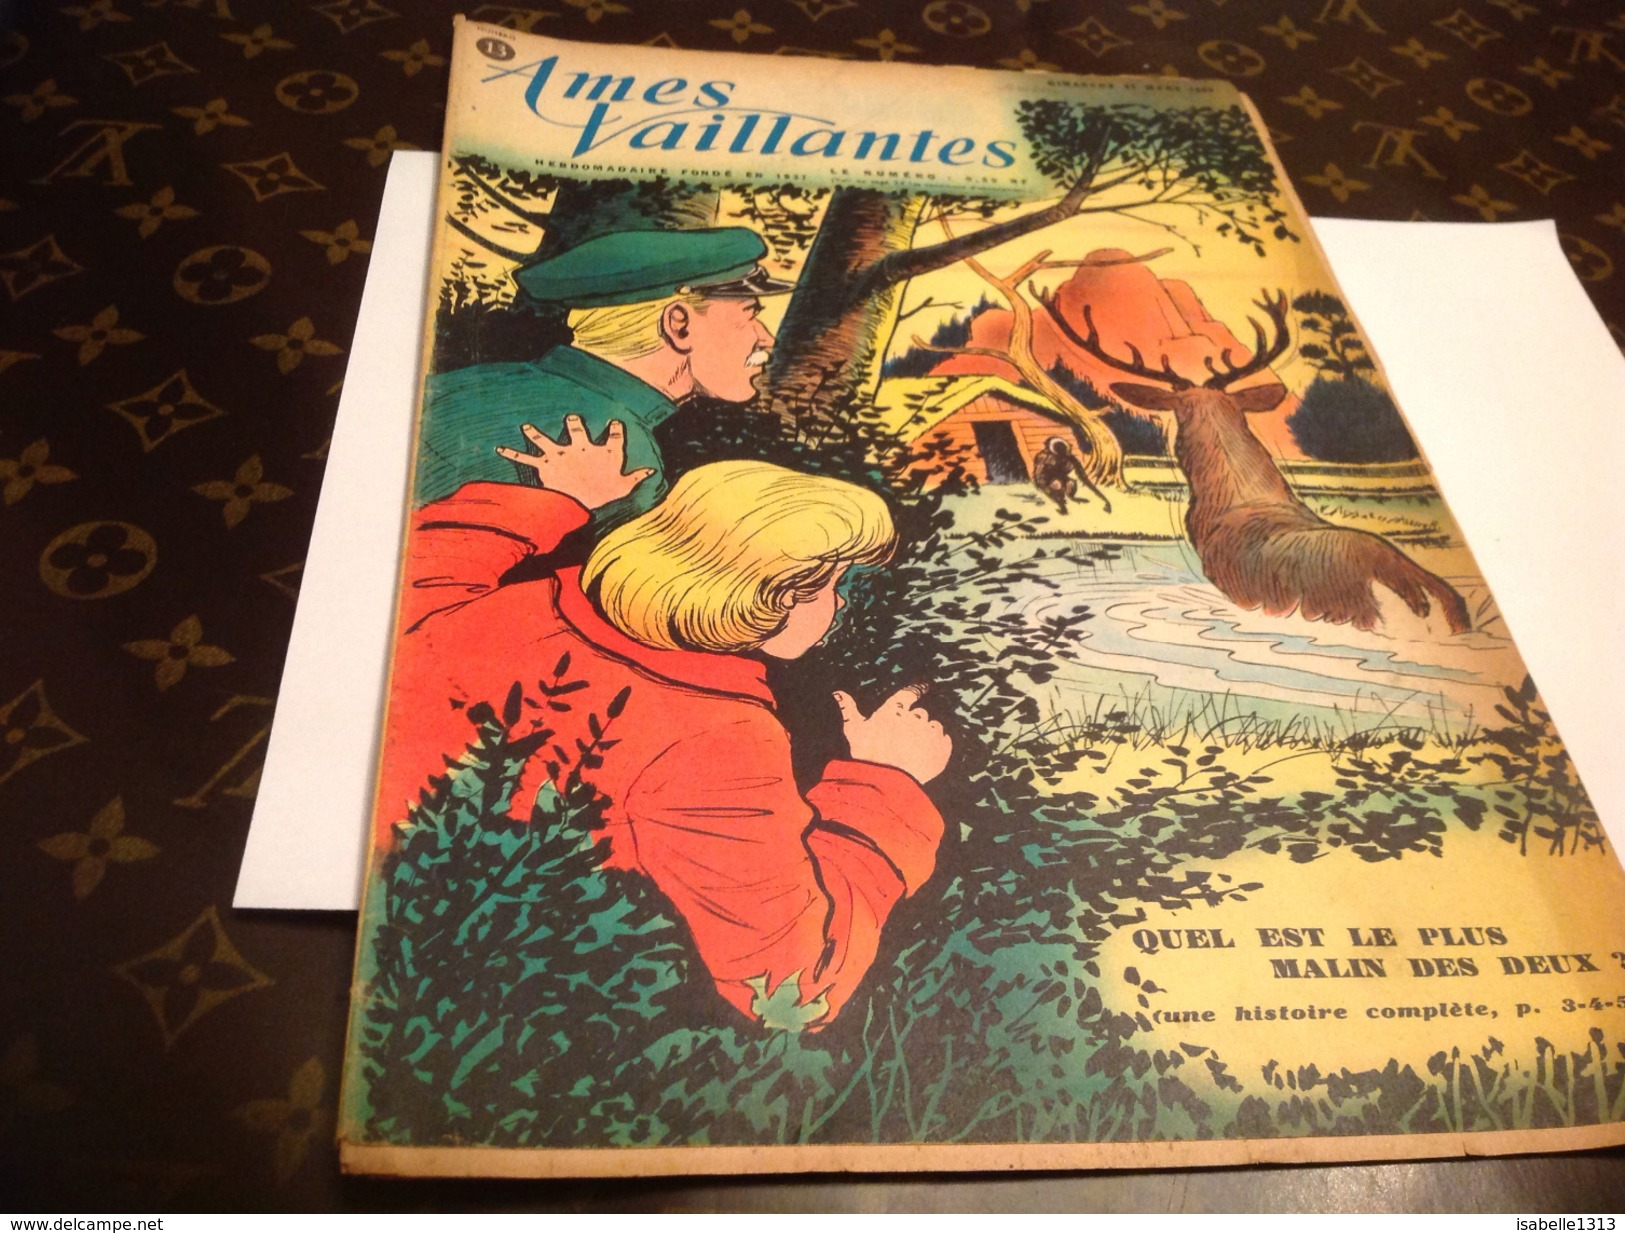 ÂMES VAILLANTES Magazines-et-periodiques-autre-magazines/ames-vaillantes 1960 - Magazines Et Périodiques